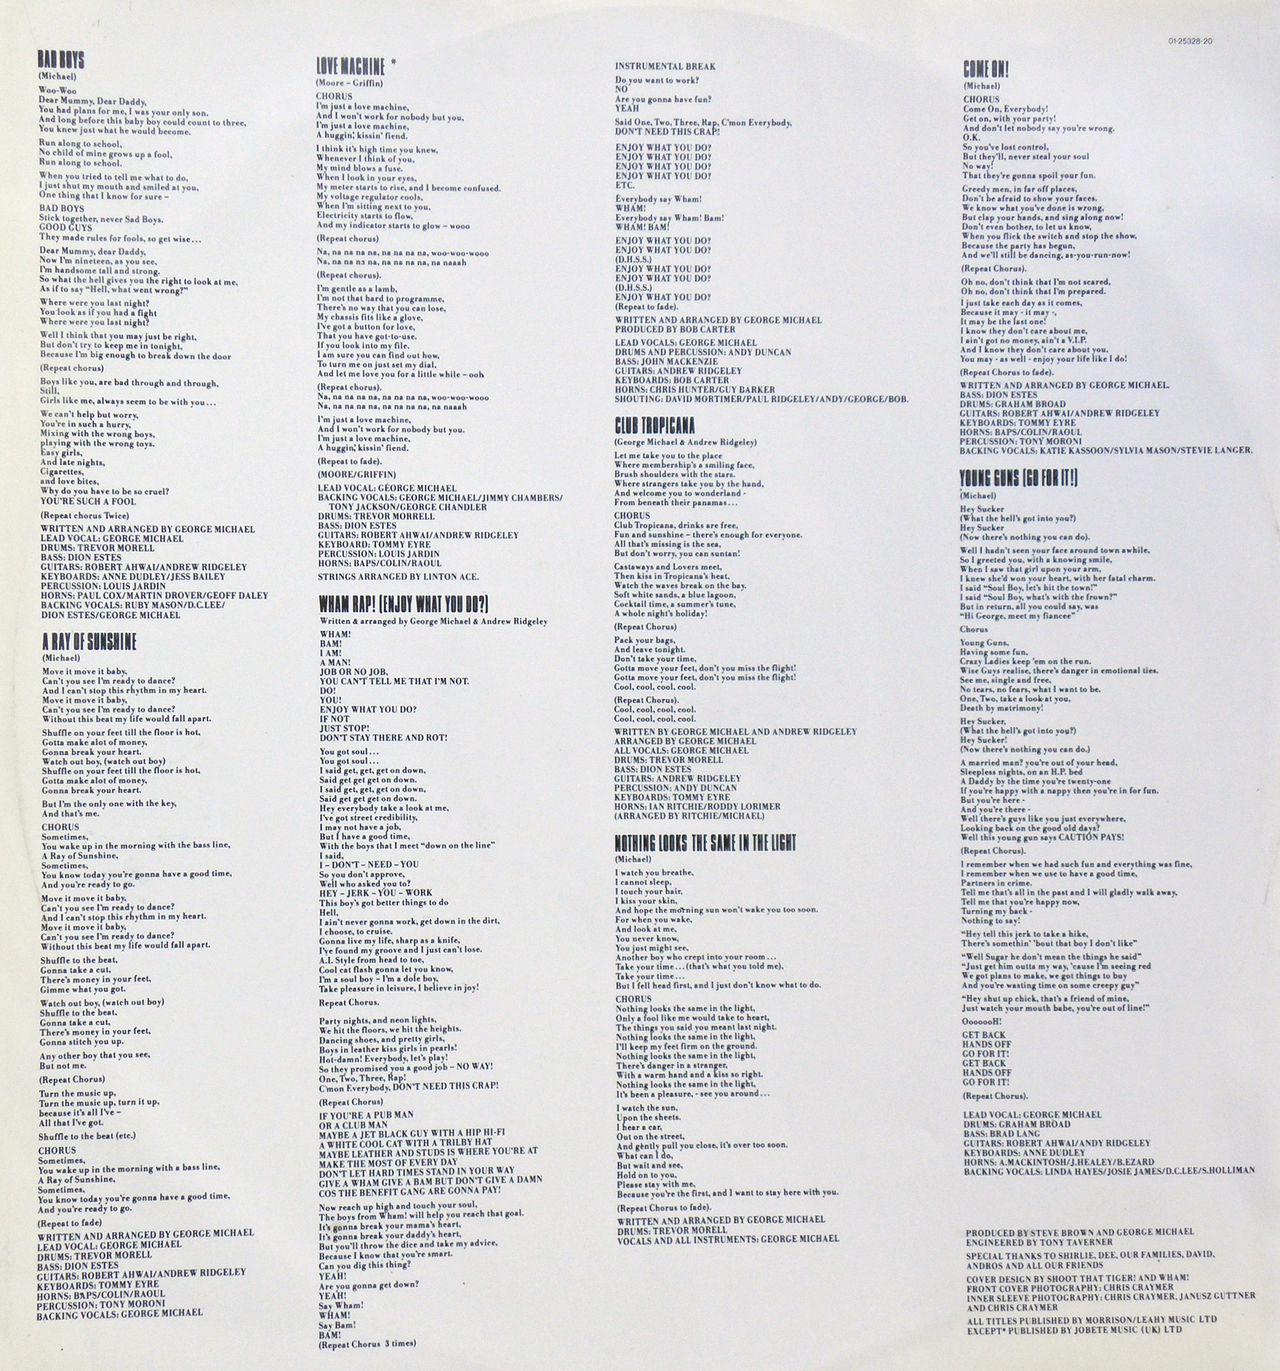 Wham! LP 'Fantastic', gramophone record inner sleeve B, George Michael & Andrew Ridgeley 1983. 1983. Album Andrew Ridgeley Charts Culture Duo Fantastic George Michael History In Memoriam LP Music Musician Popular Singer  Songwriter WHAM!